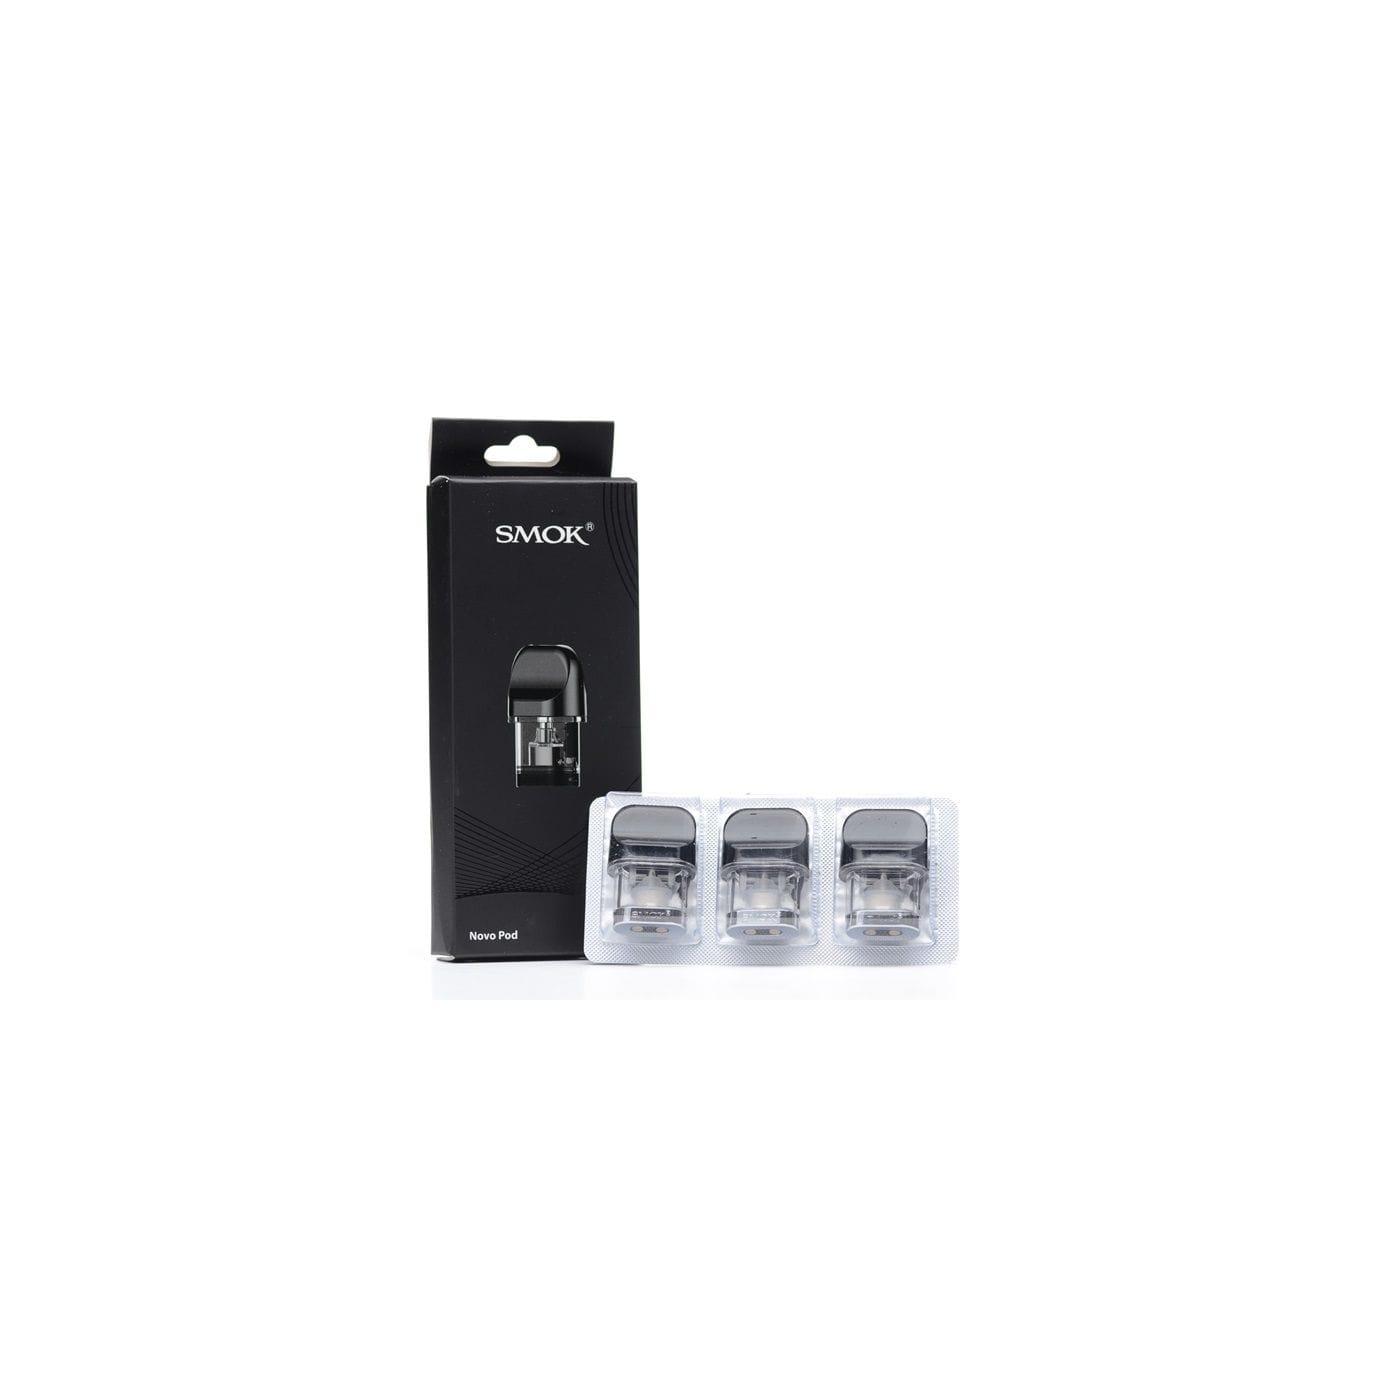 Smok Novo 3 Mesh Pod - 0.8 ohm - 3 Pack